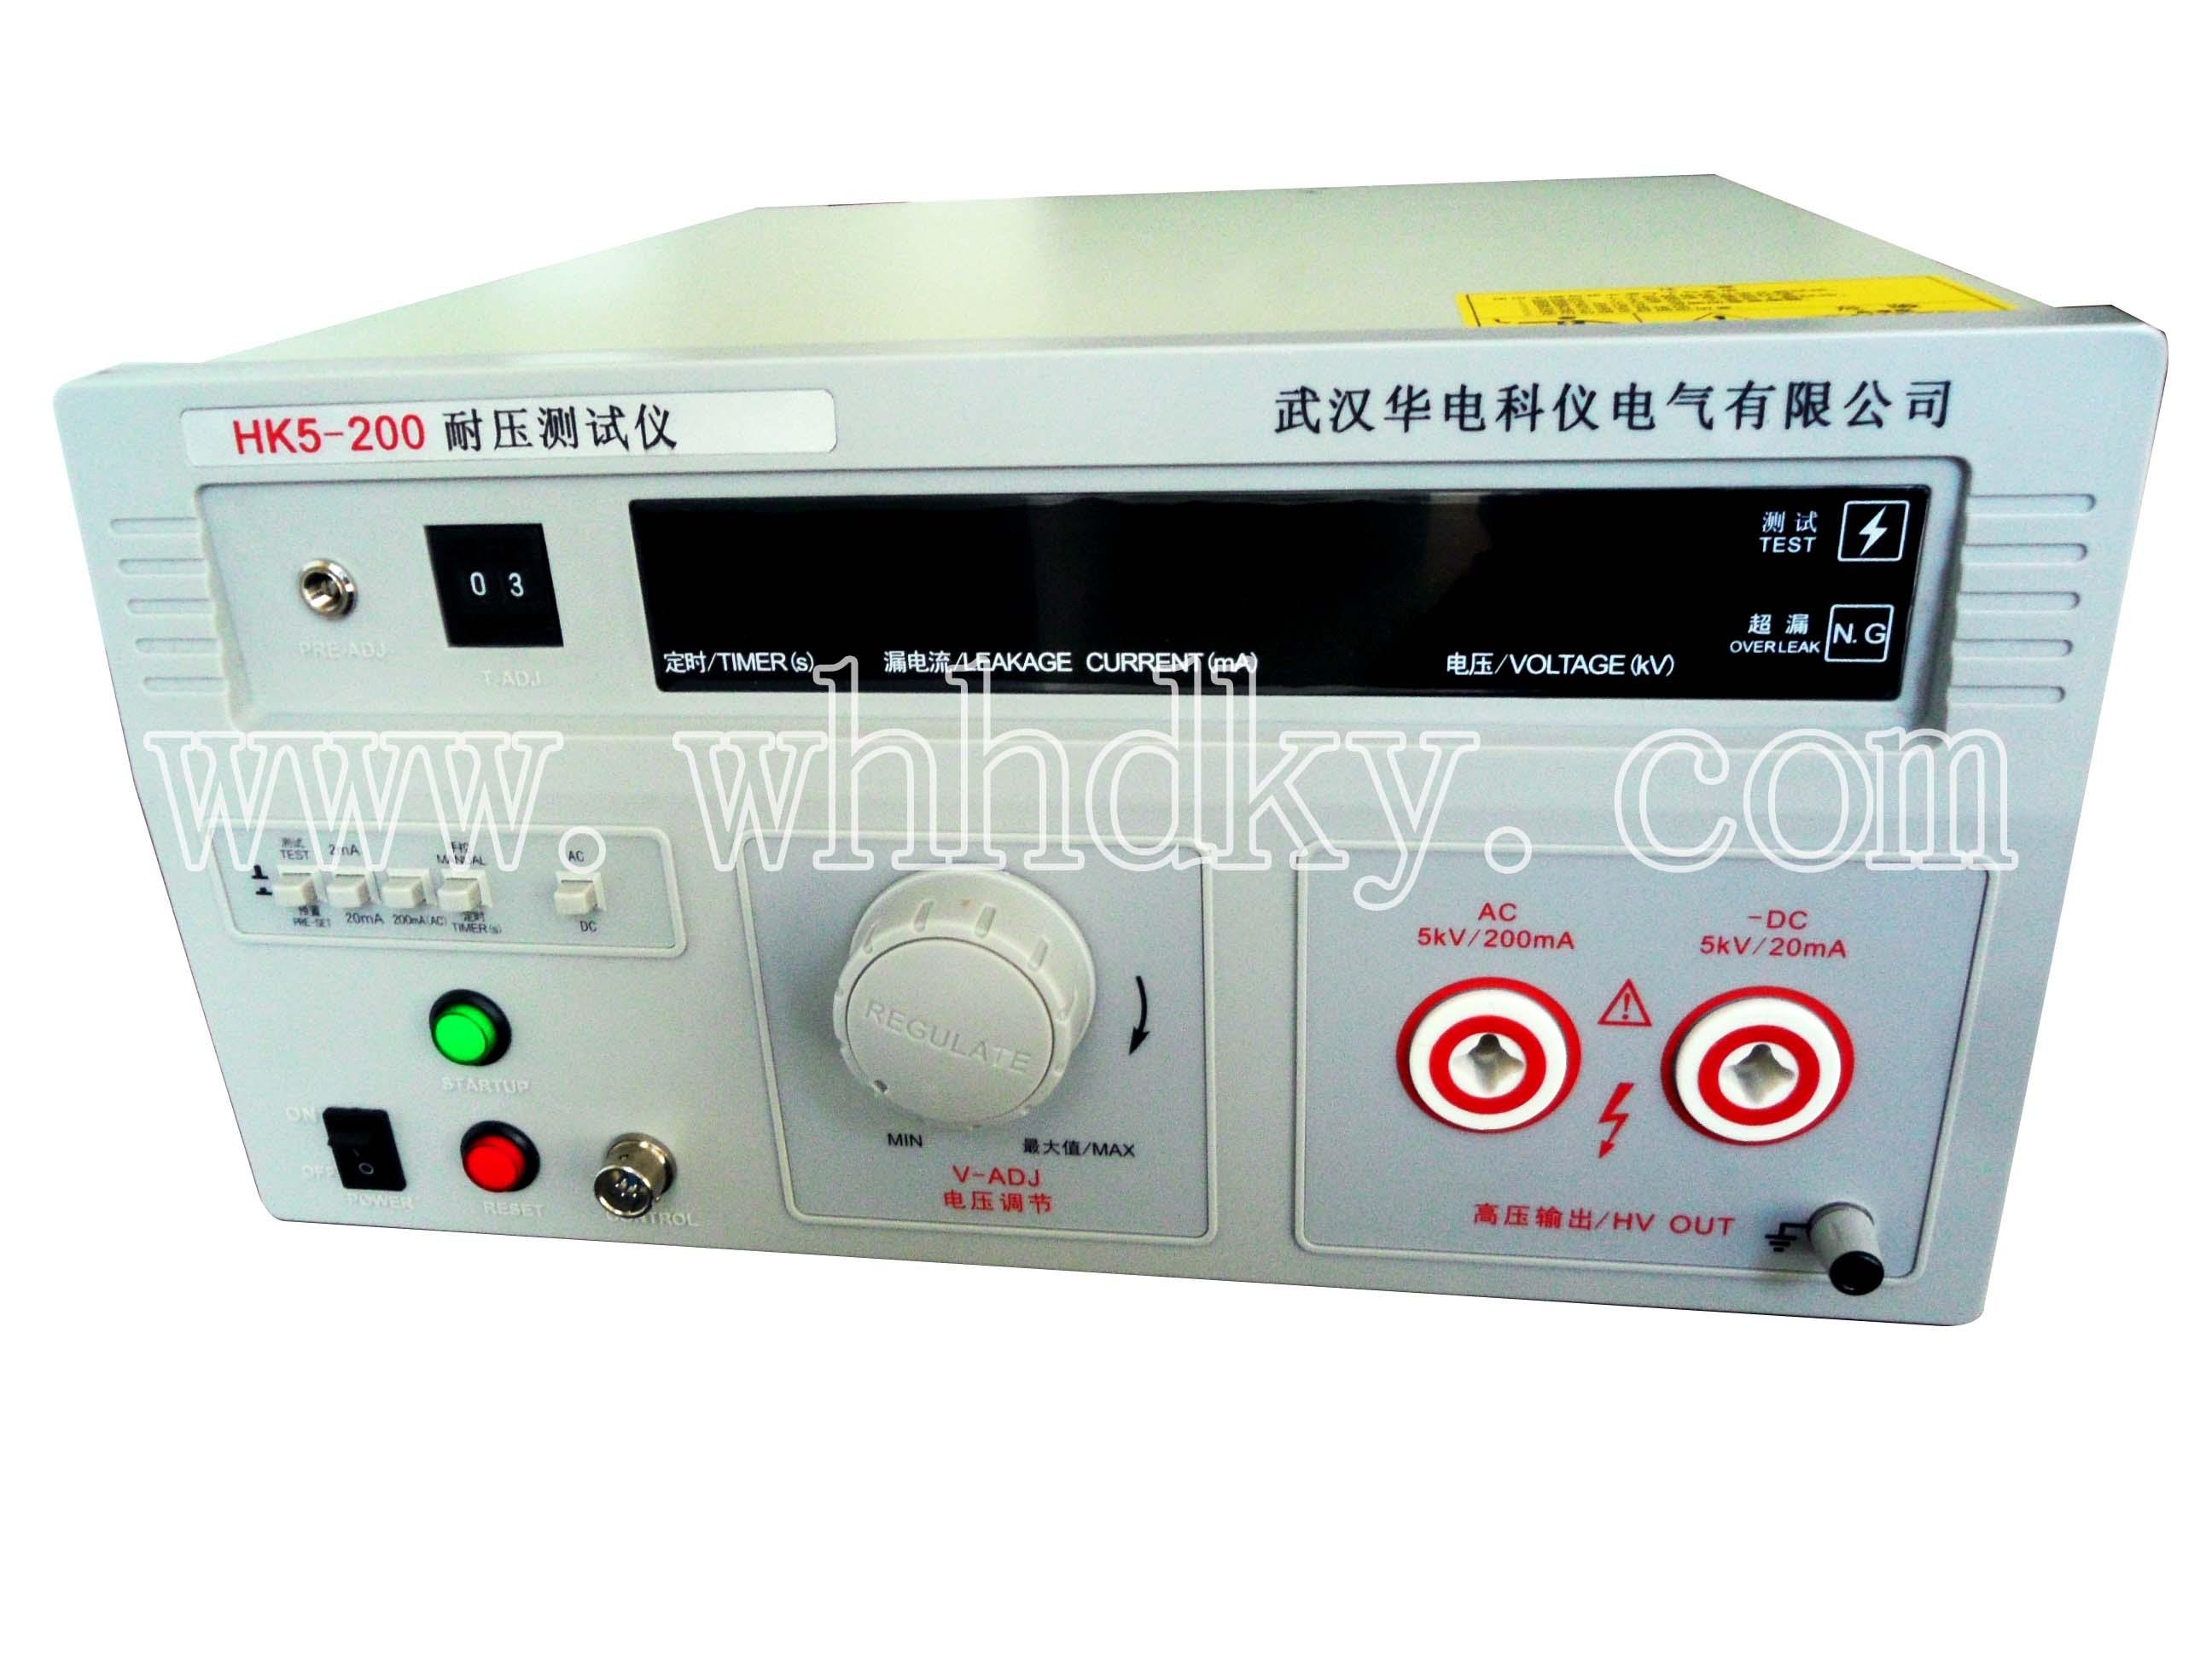 HK5-200耐压青娱乐视频首页